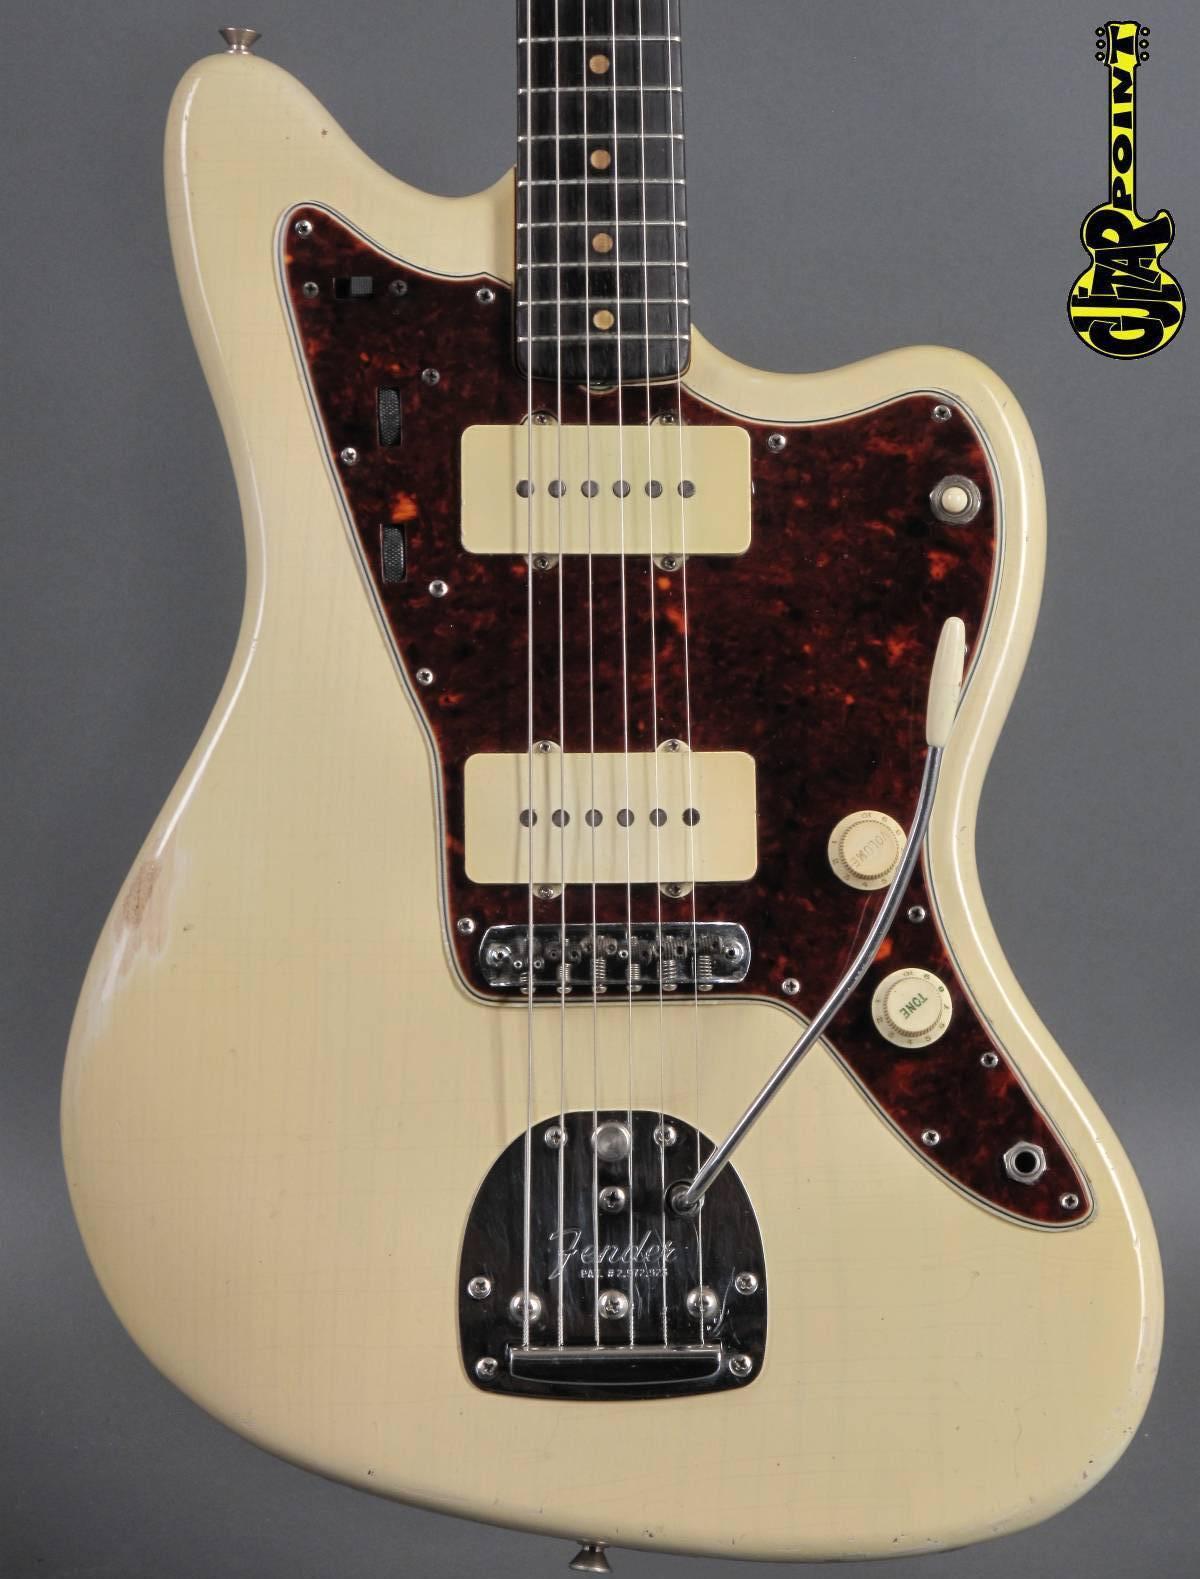 1964 Fender Jazzmaster - White Ash